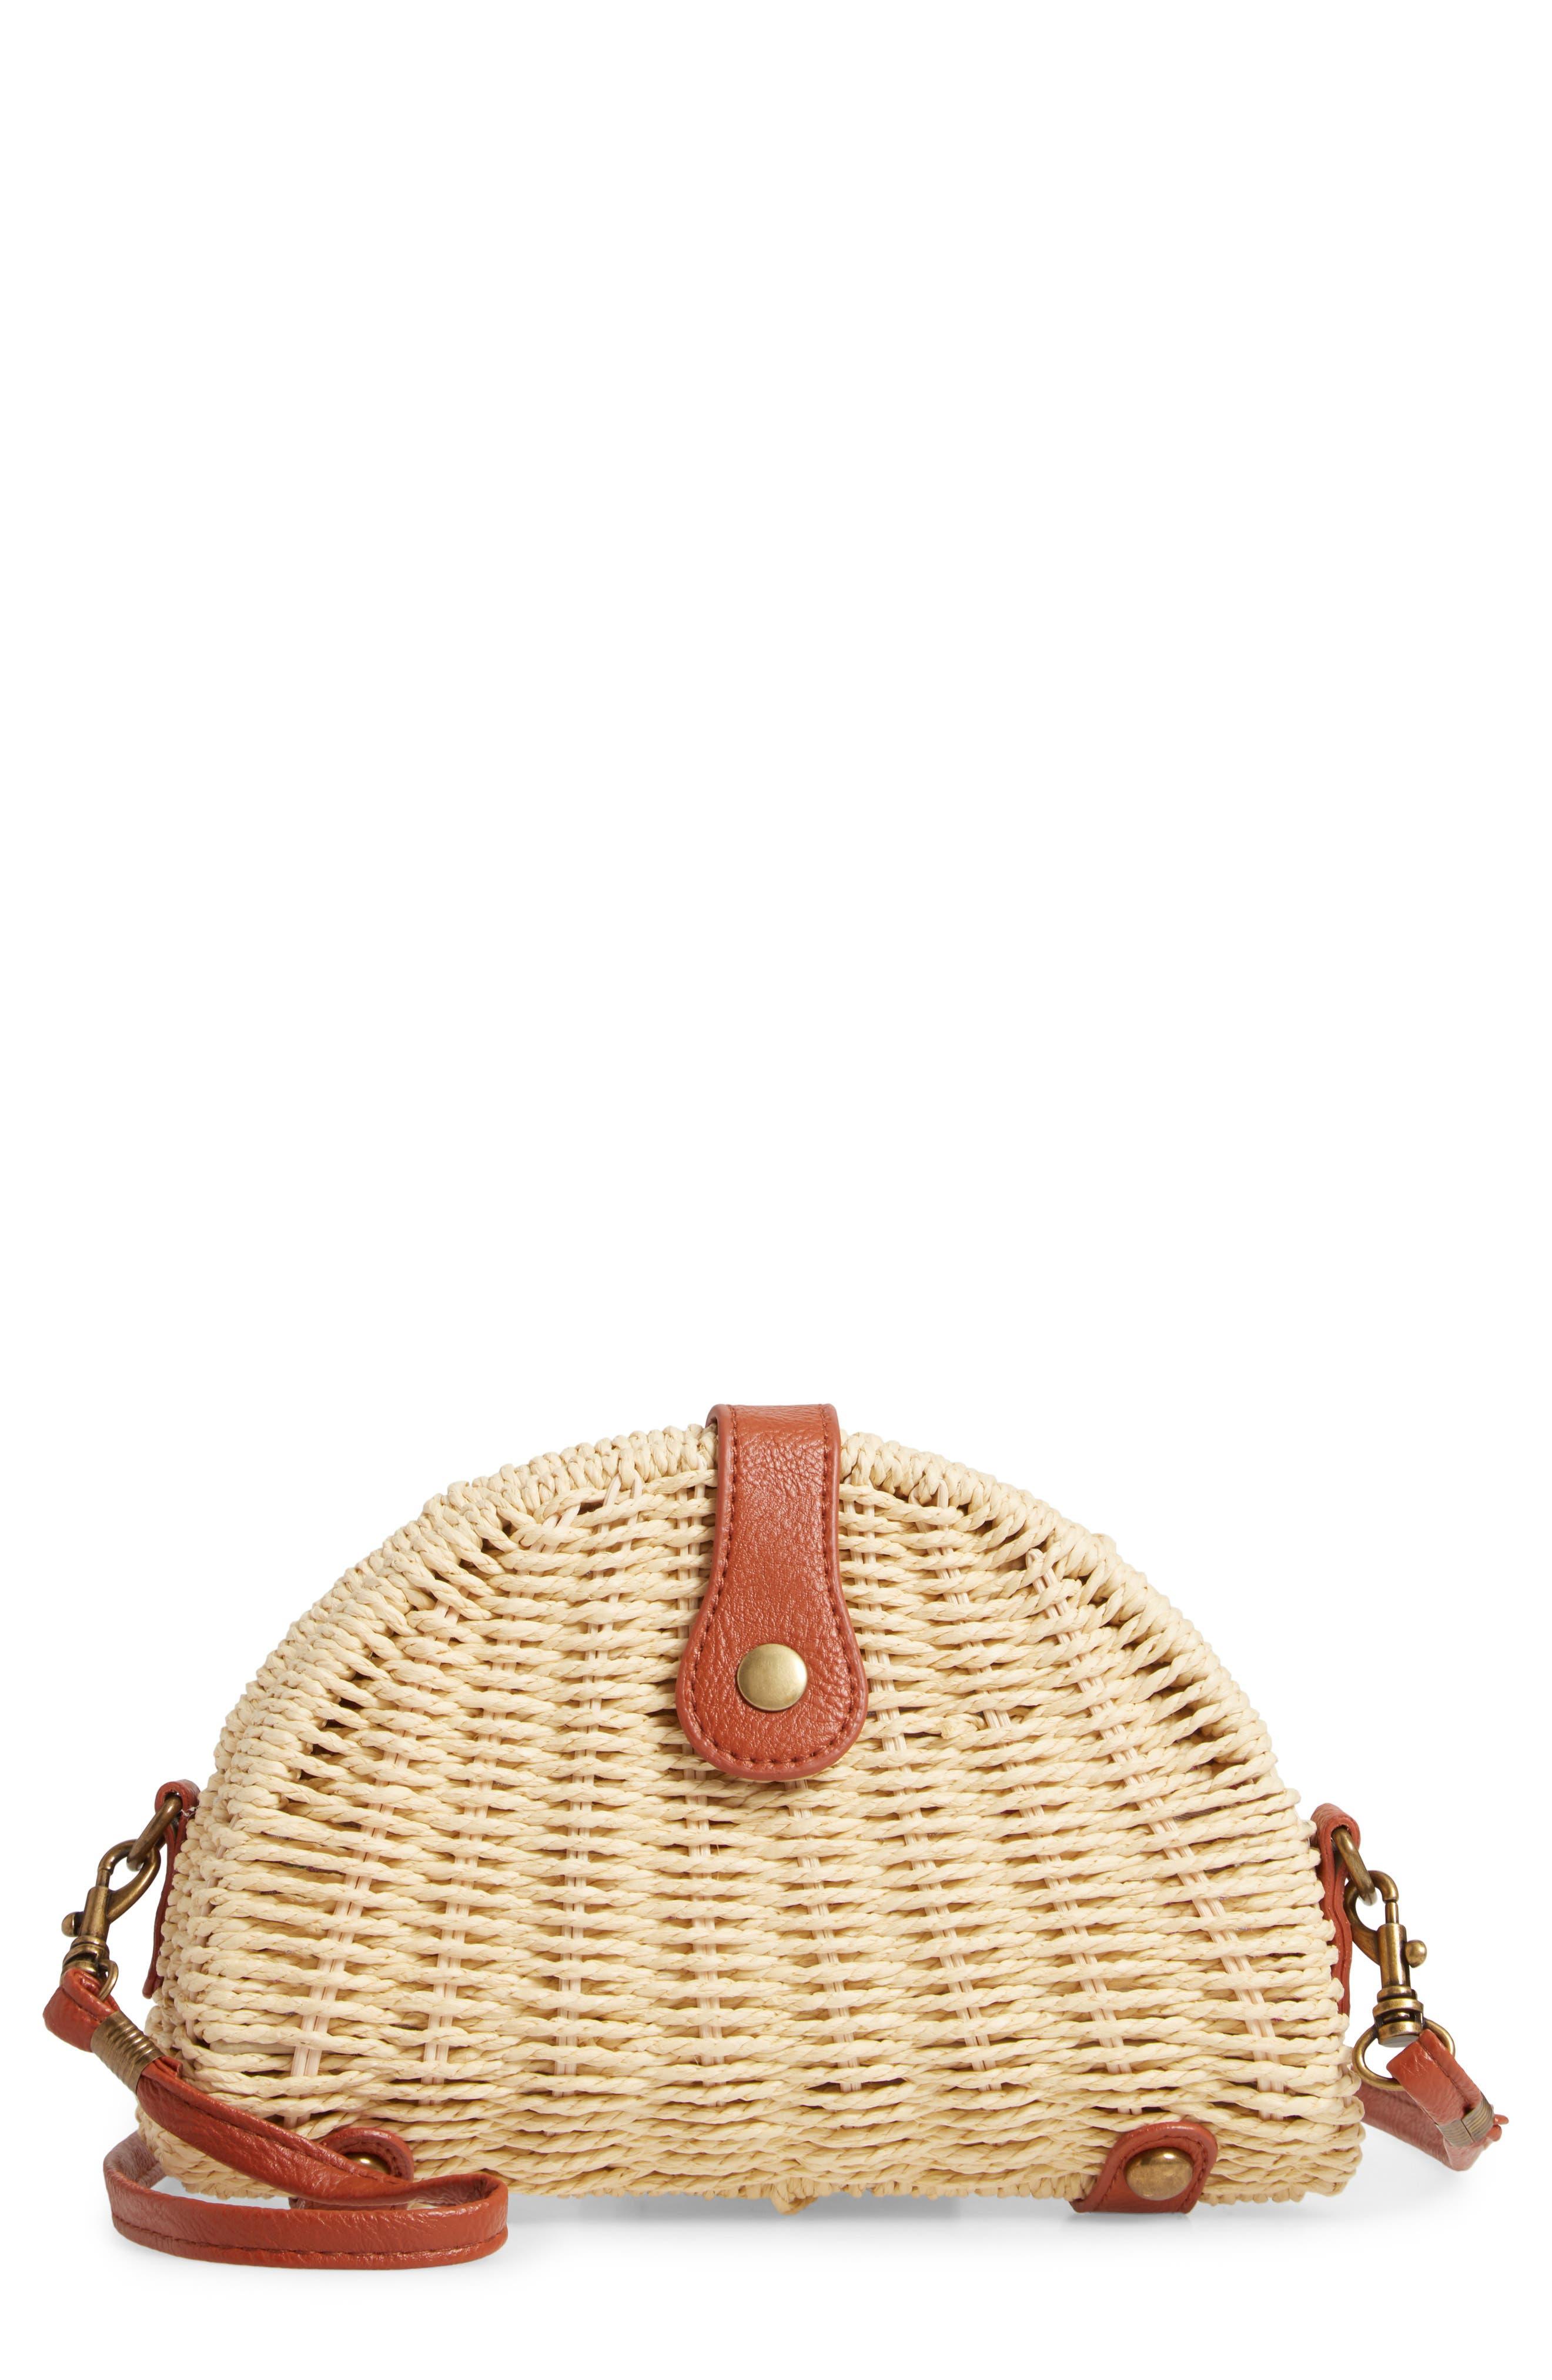 LA DOUBLE 7 Faux Leather Trim Straw Crossbody Bag, Main, color, NATURAL